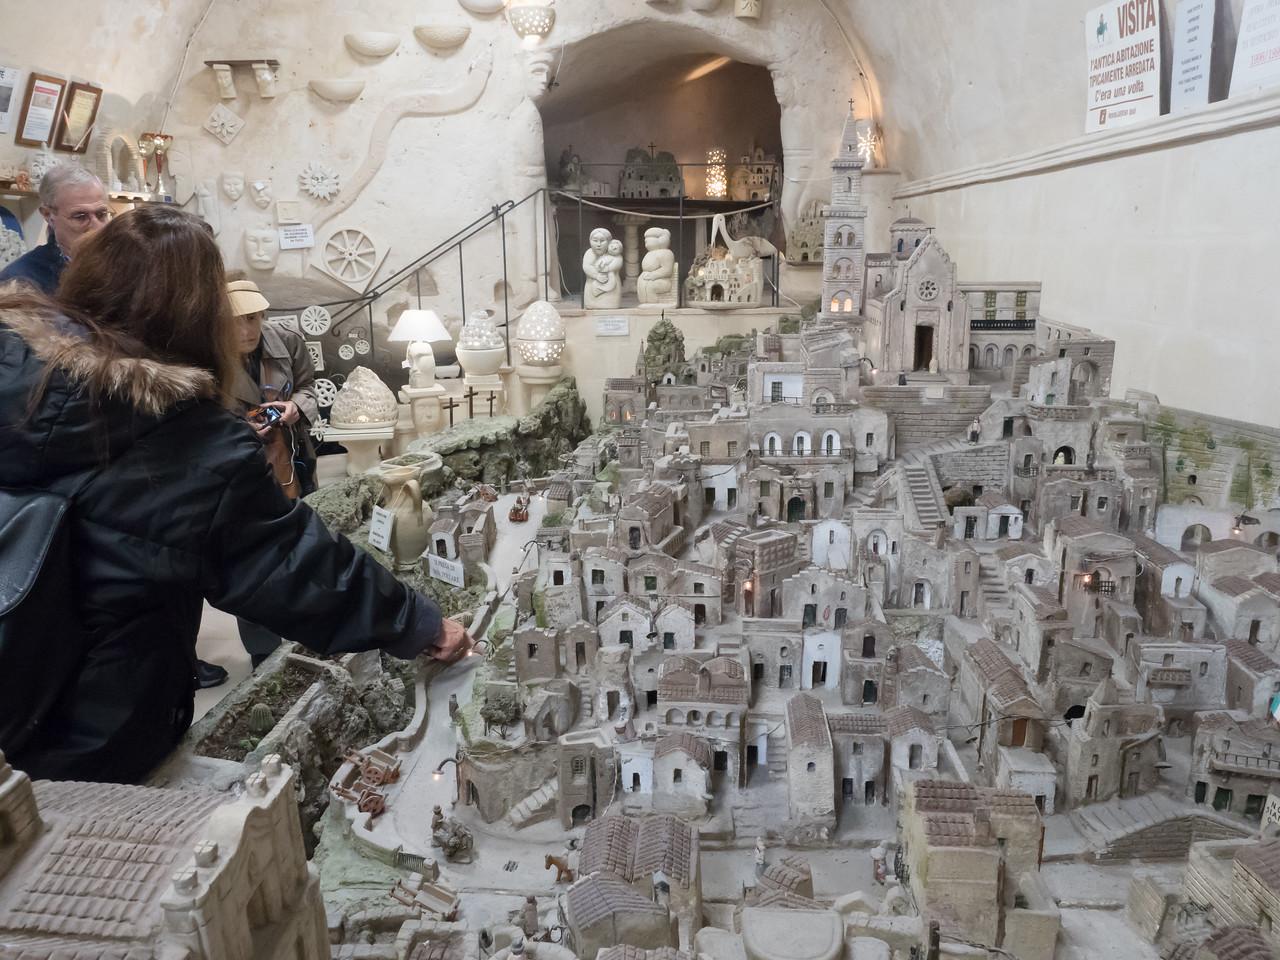 Artist's model of the Sassi in Matra